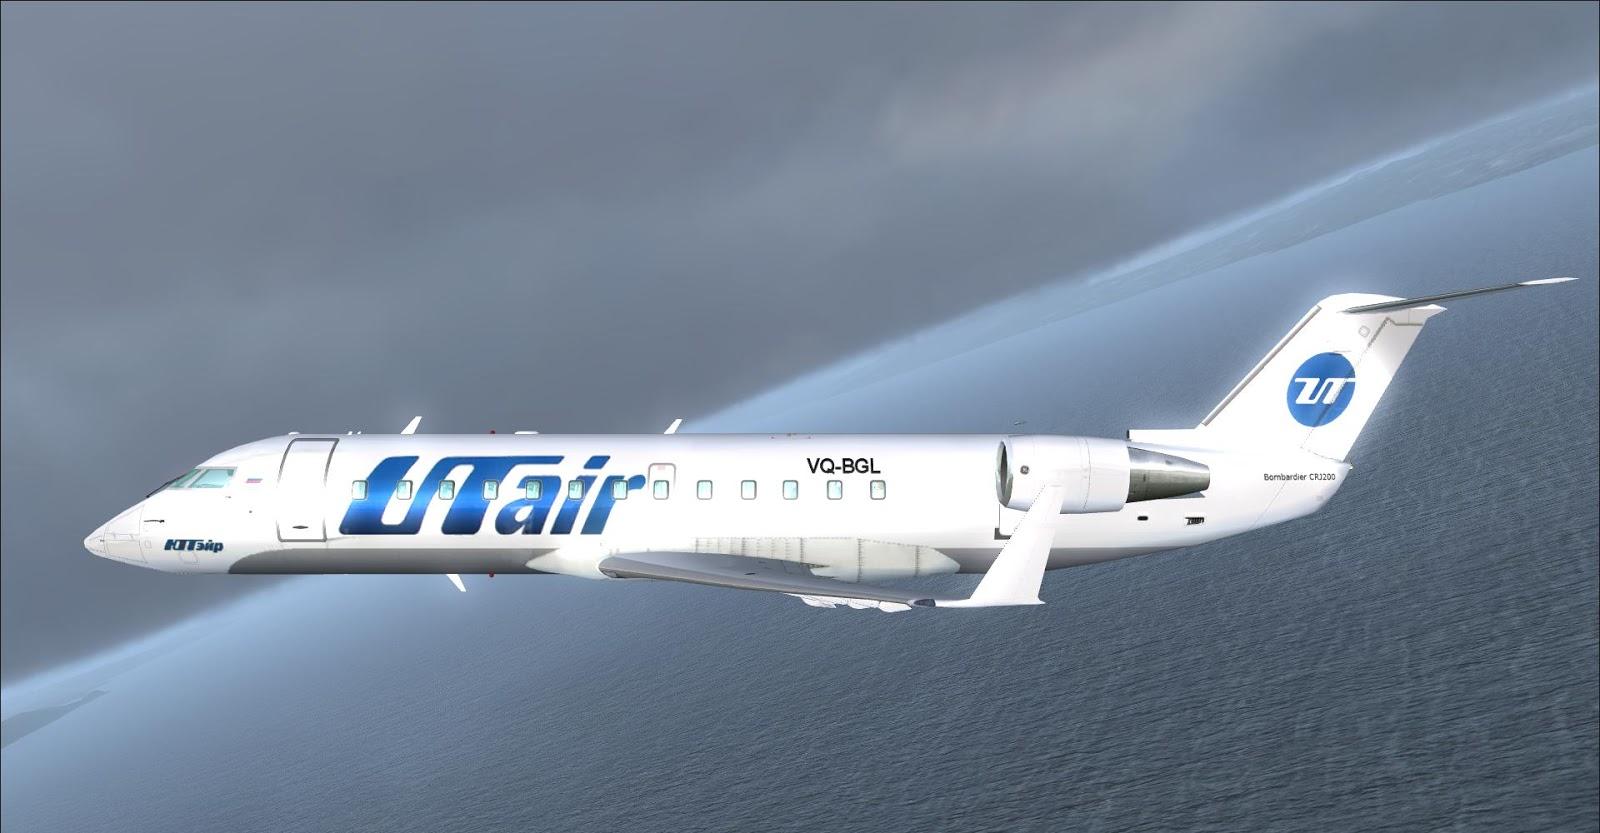 aerei per fsx gratis